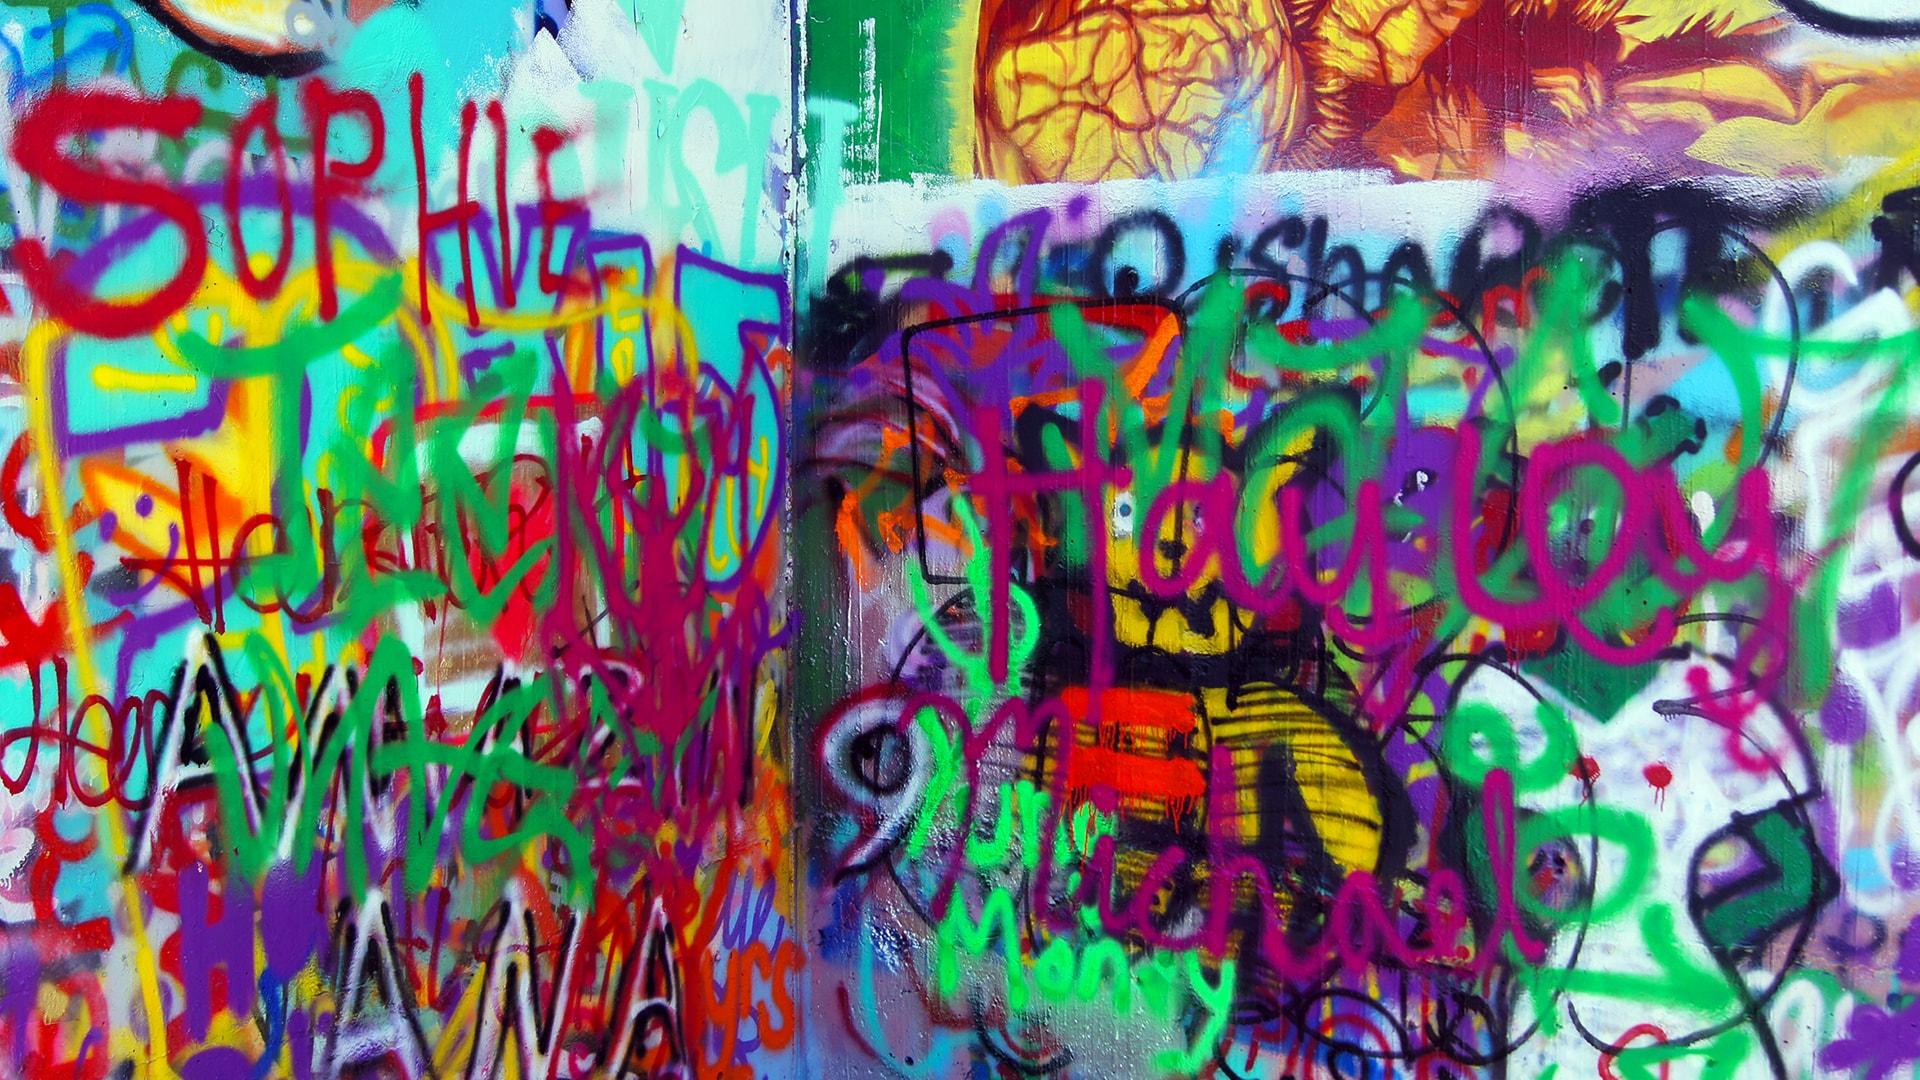 baylor street art wall graffiti